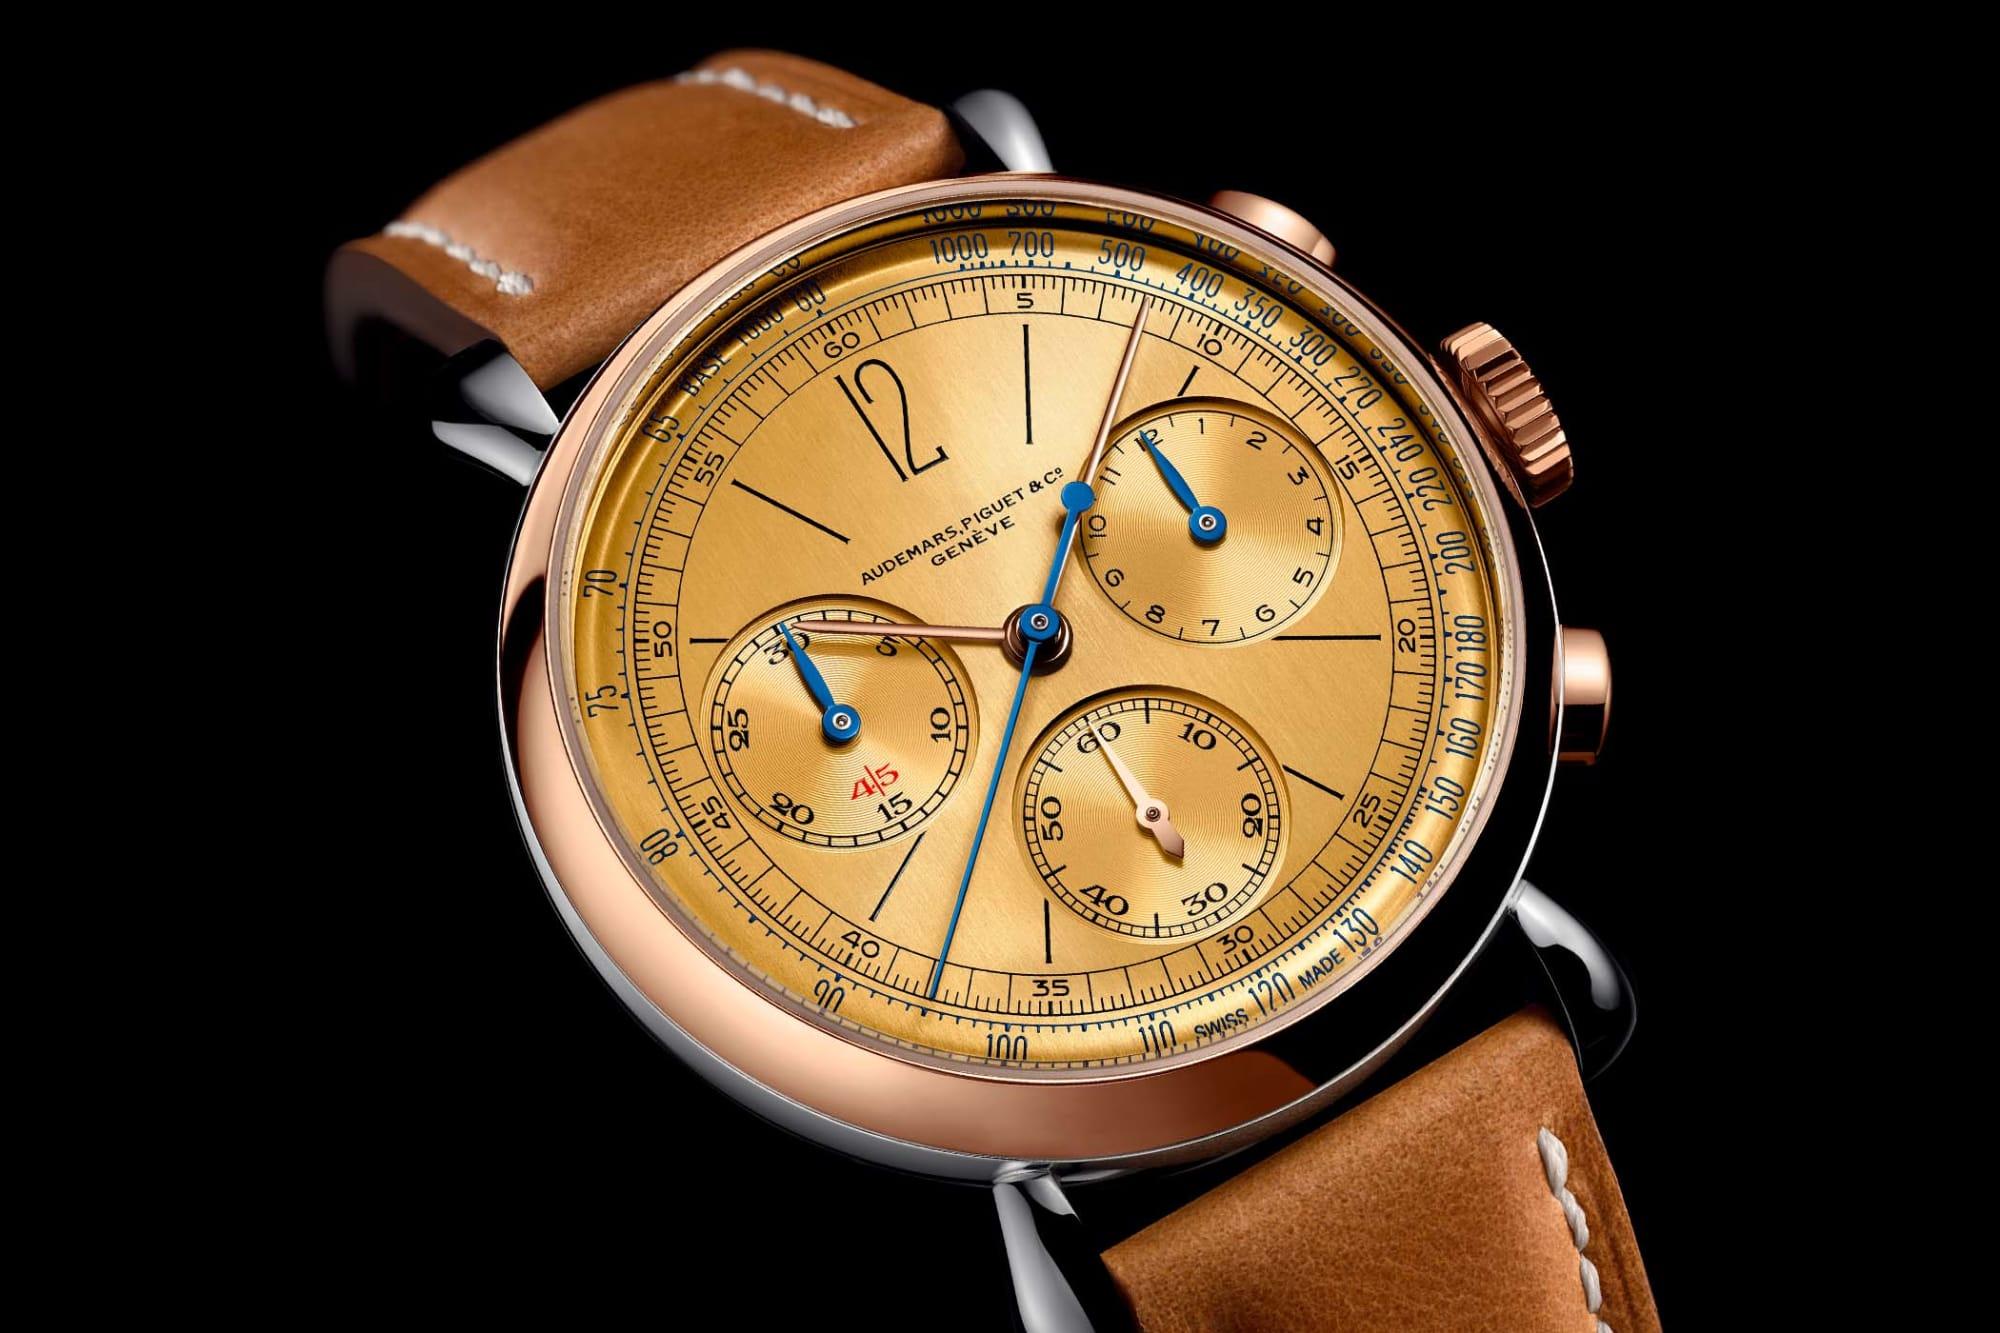 Remaster01 chronograph